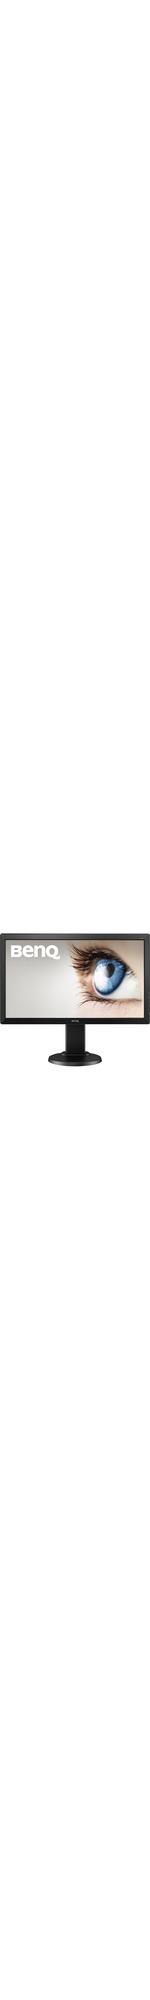 BenQ BL2405PT 24And#34; LED Monitor